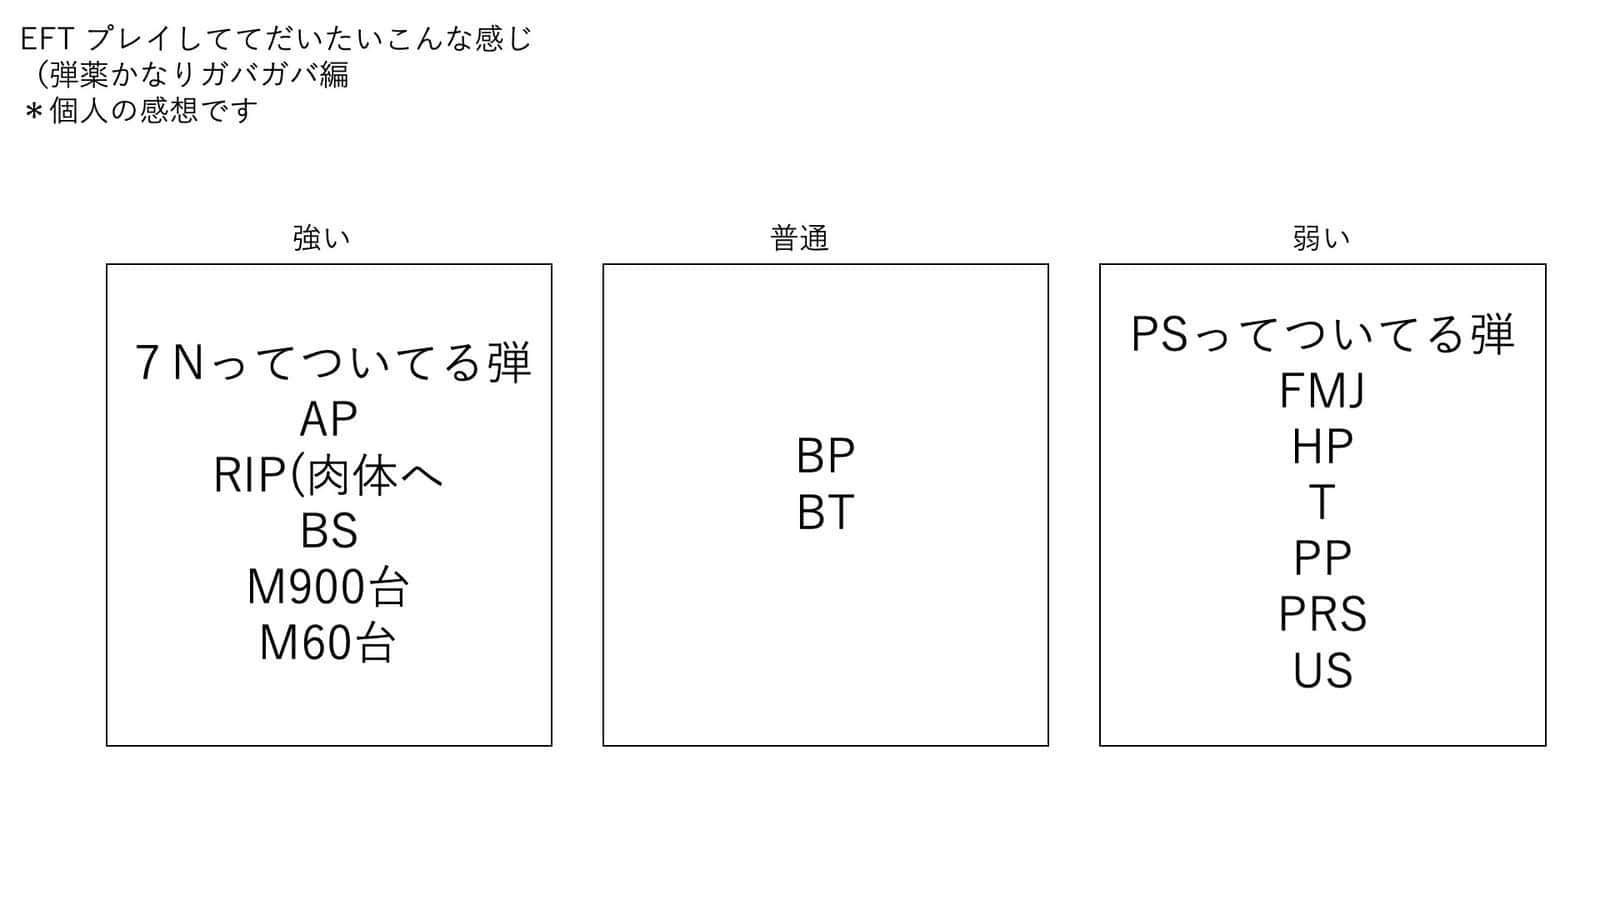 f:id:gamelifecompany55:20210201113001j:plain